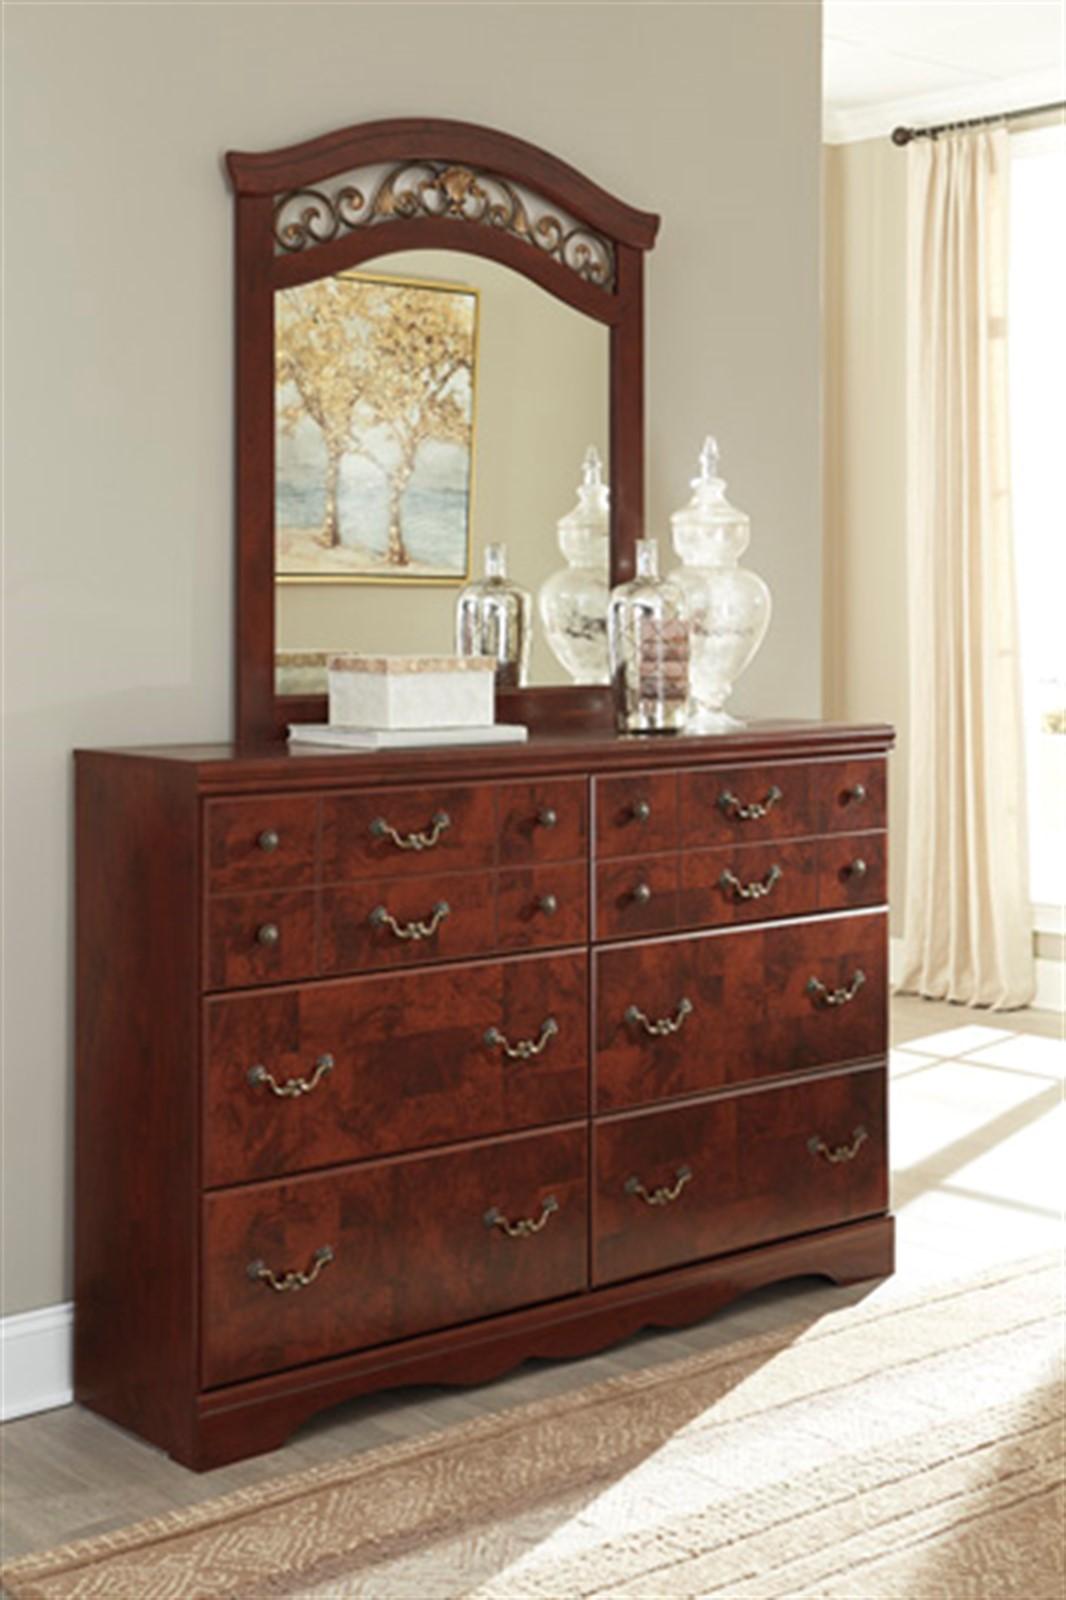 Delianna Dresser and Mirror Set - Reddish Brown